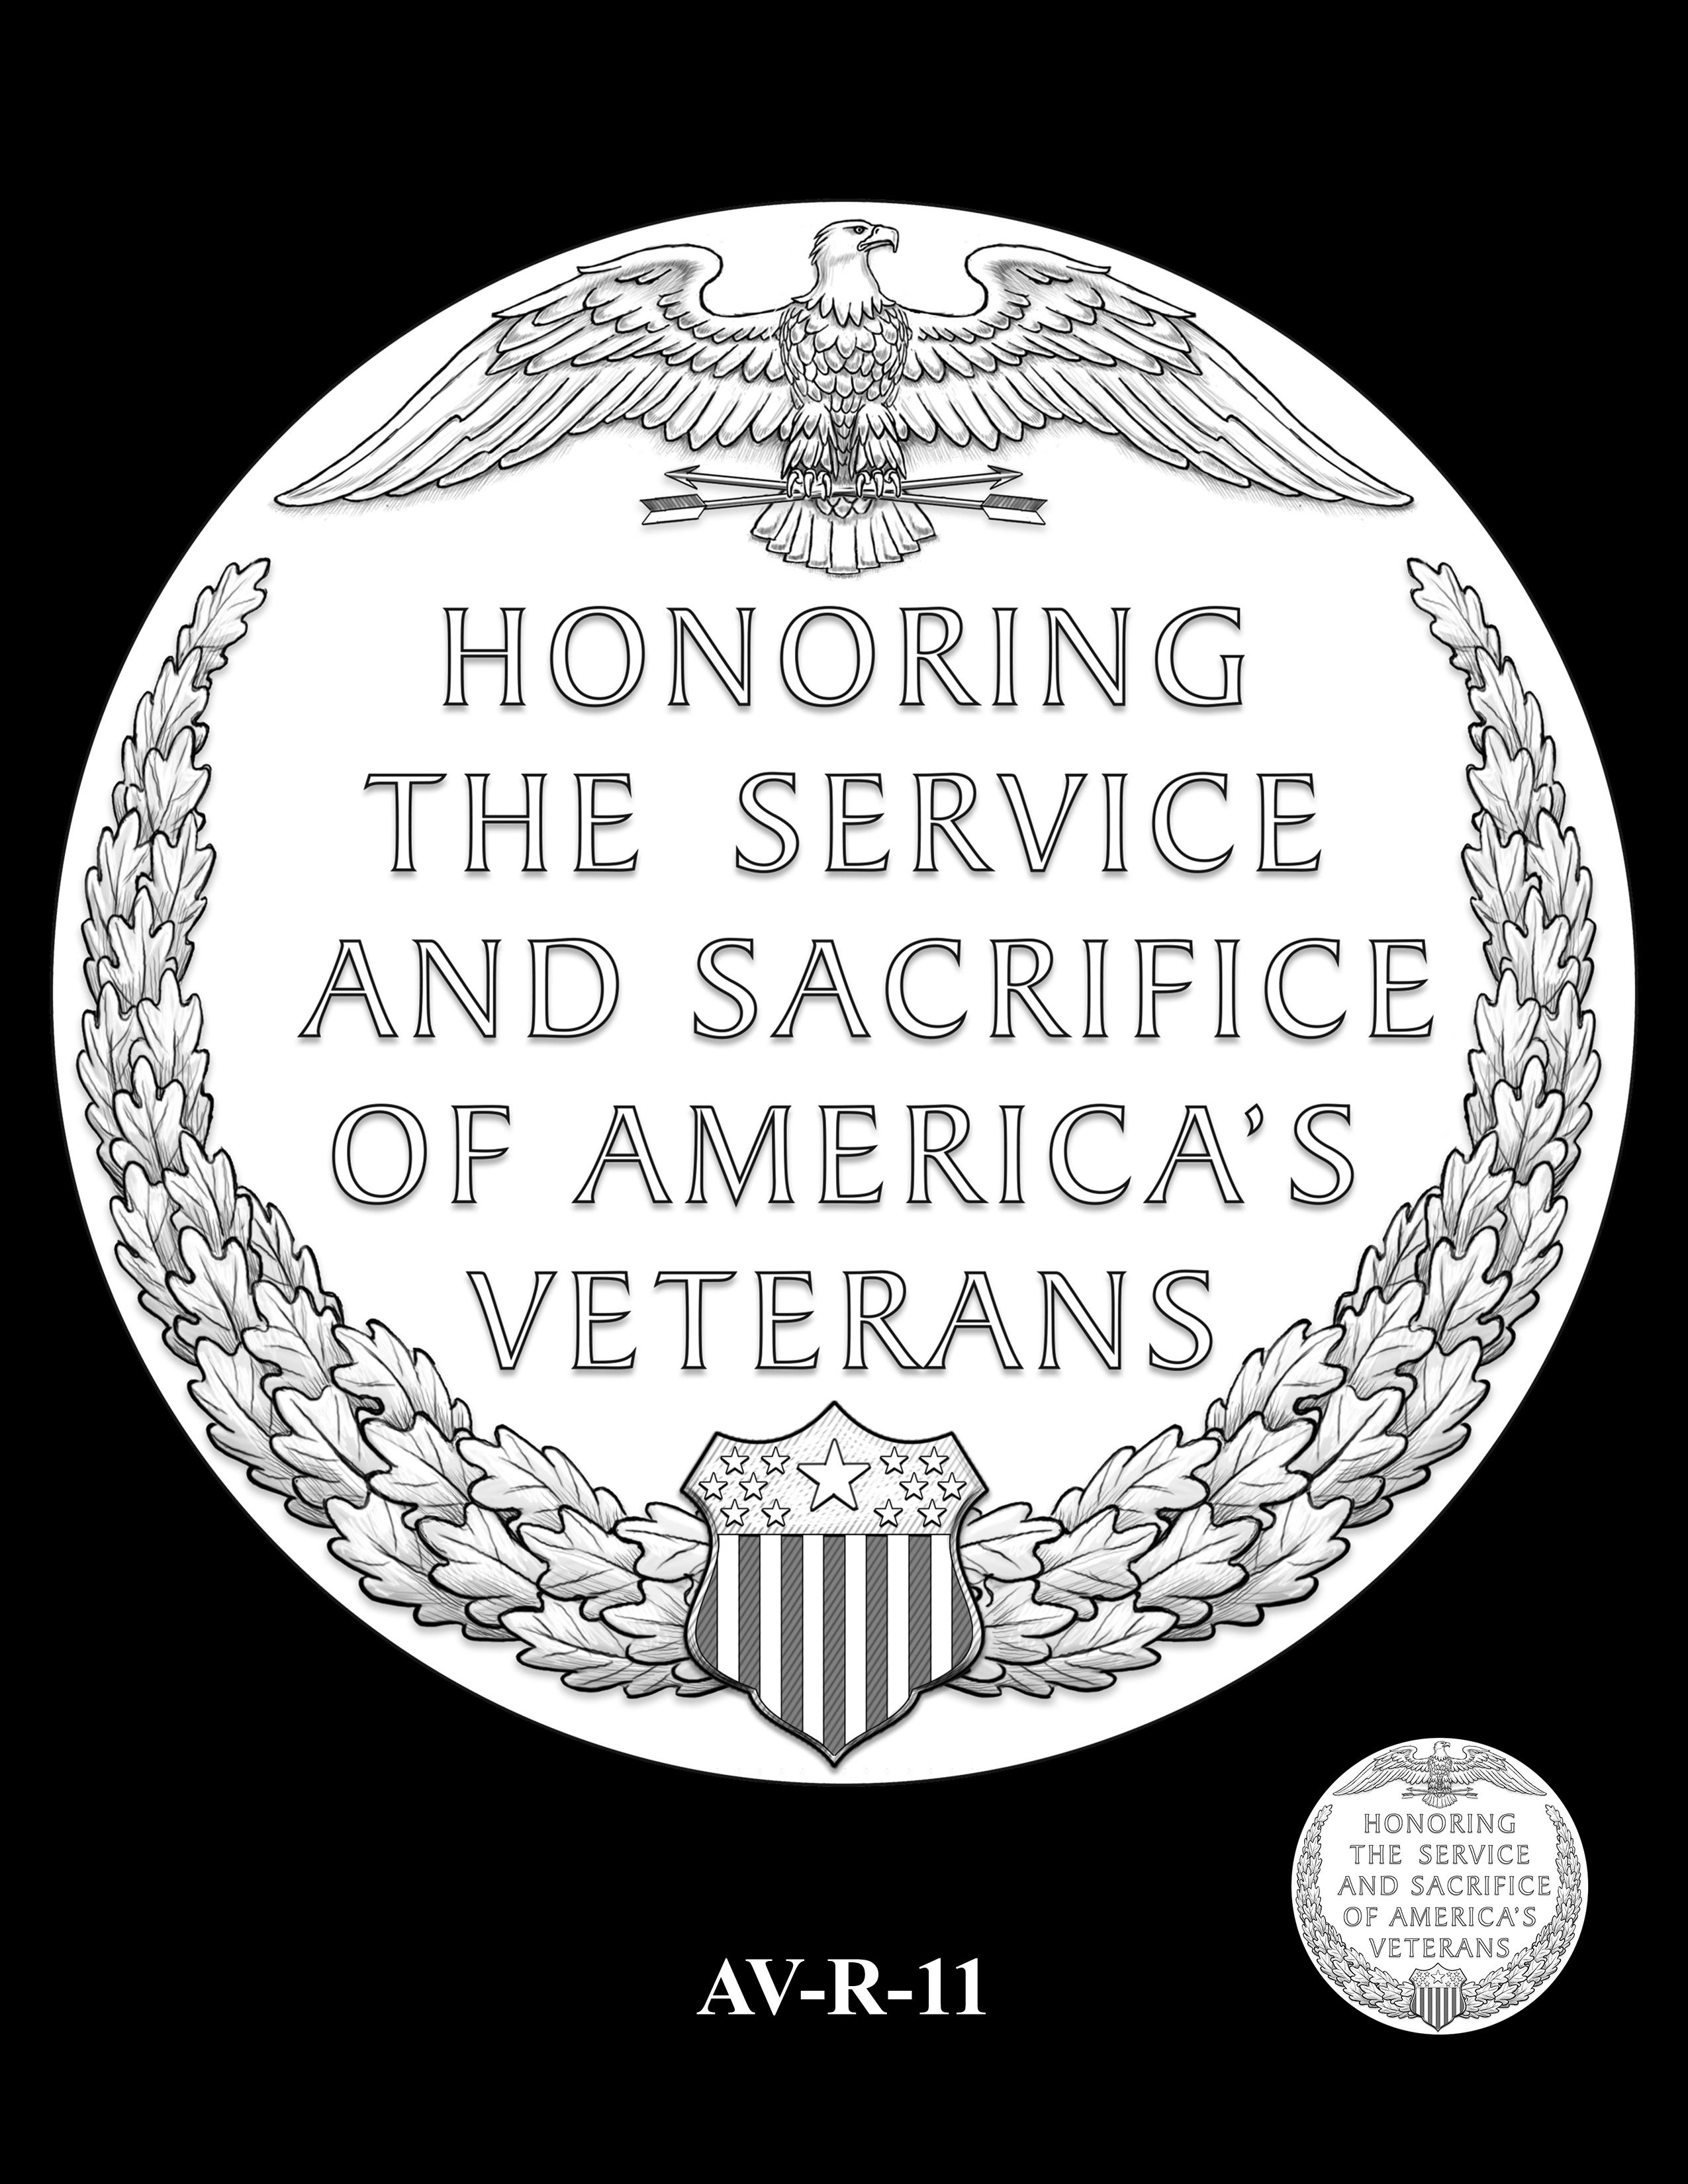 AV-R-11 - American Veterans Medal